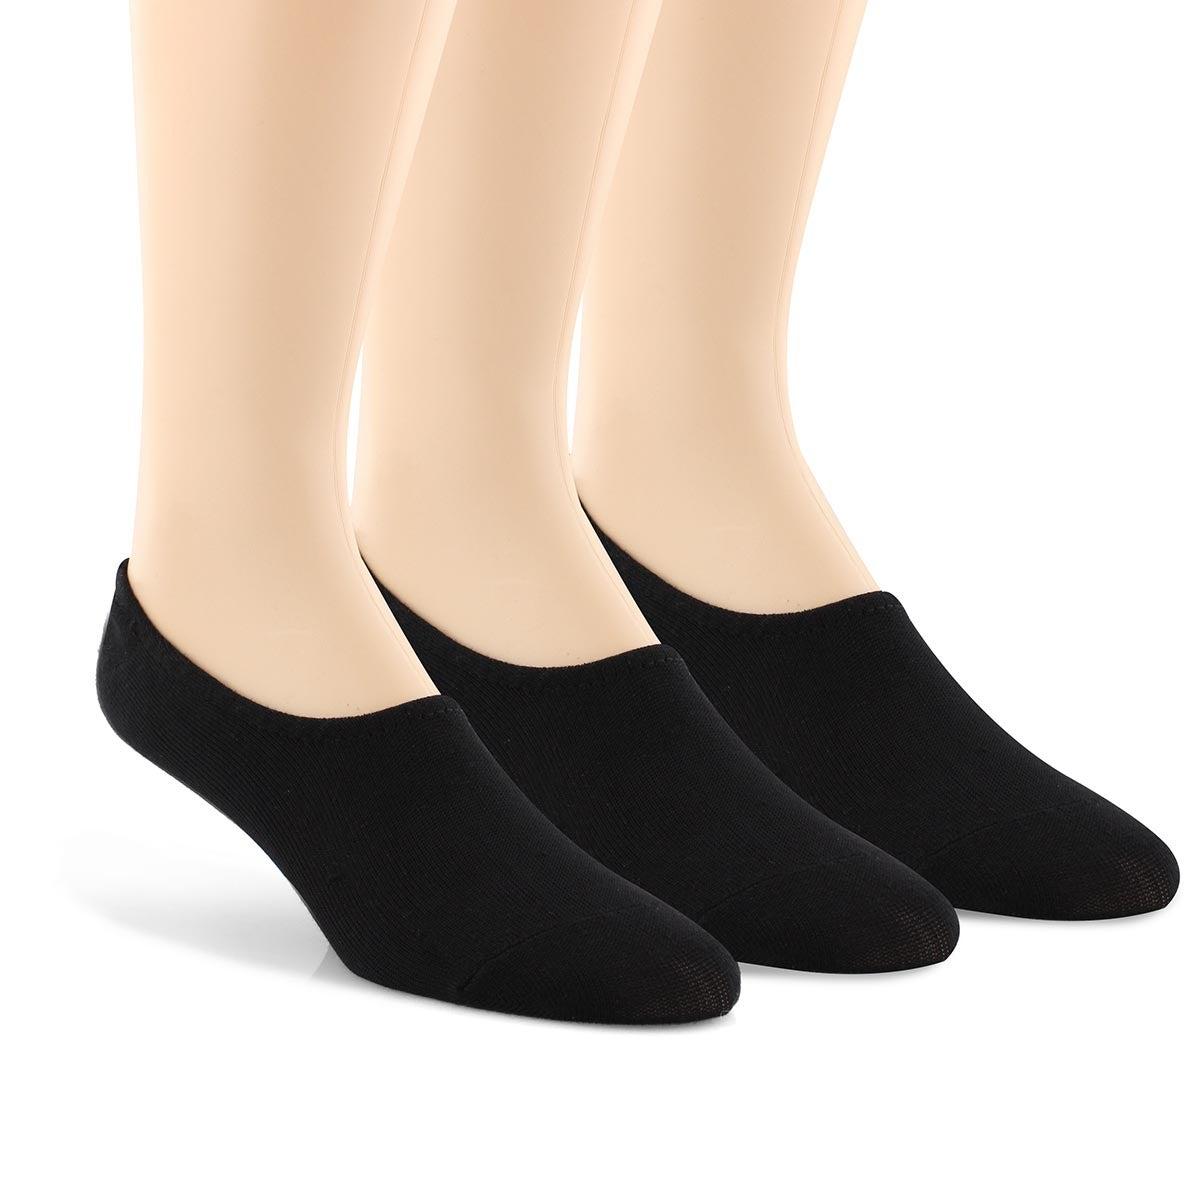 Mns Non Terry No Show black socks 3pk